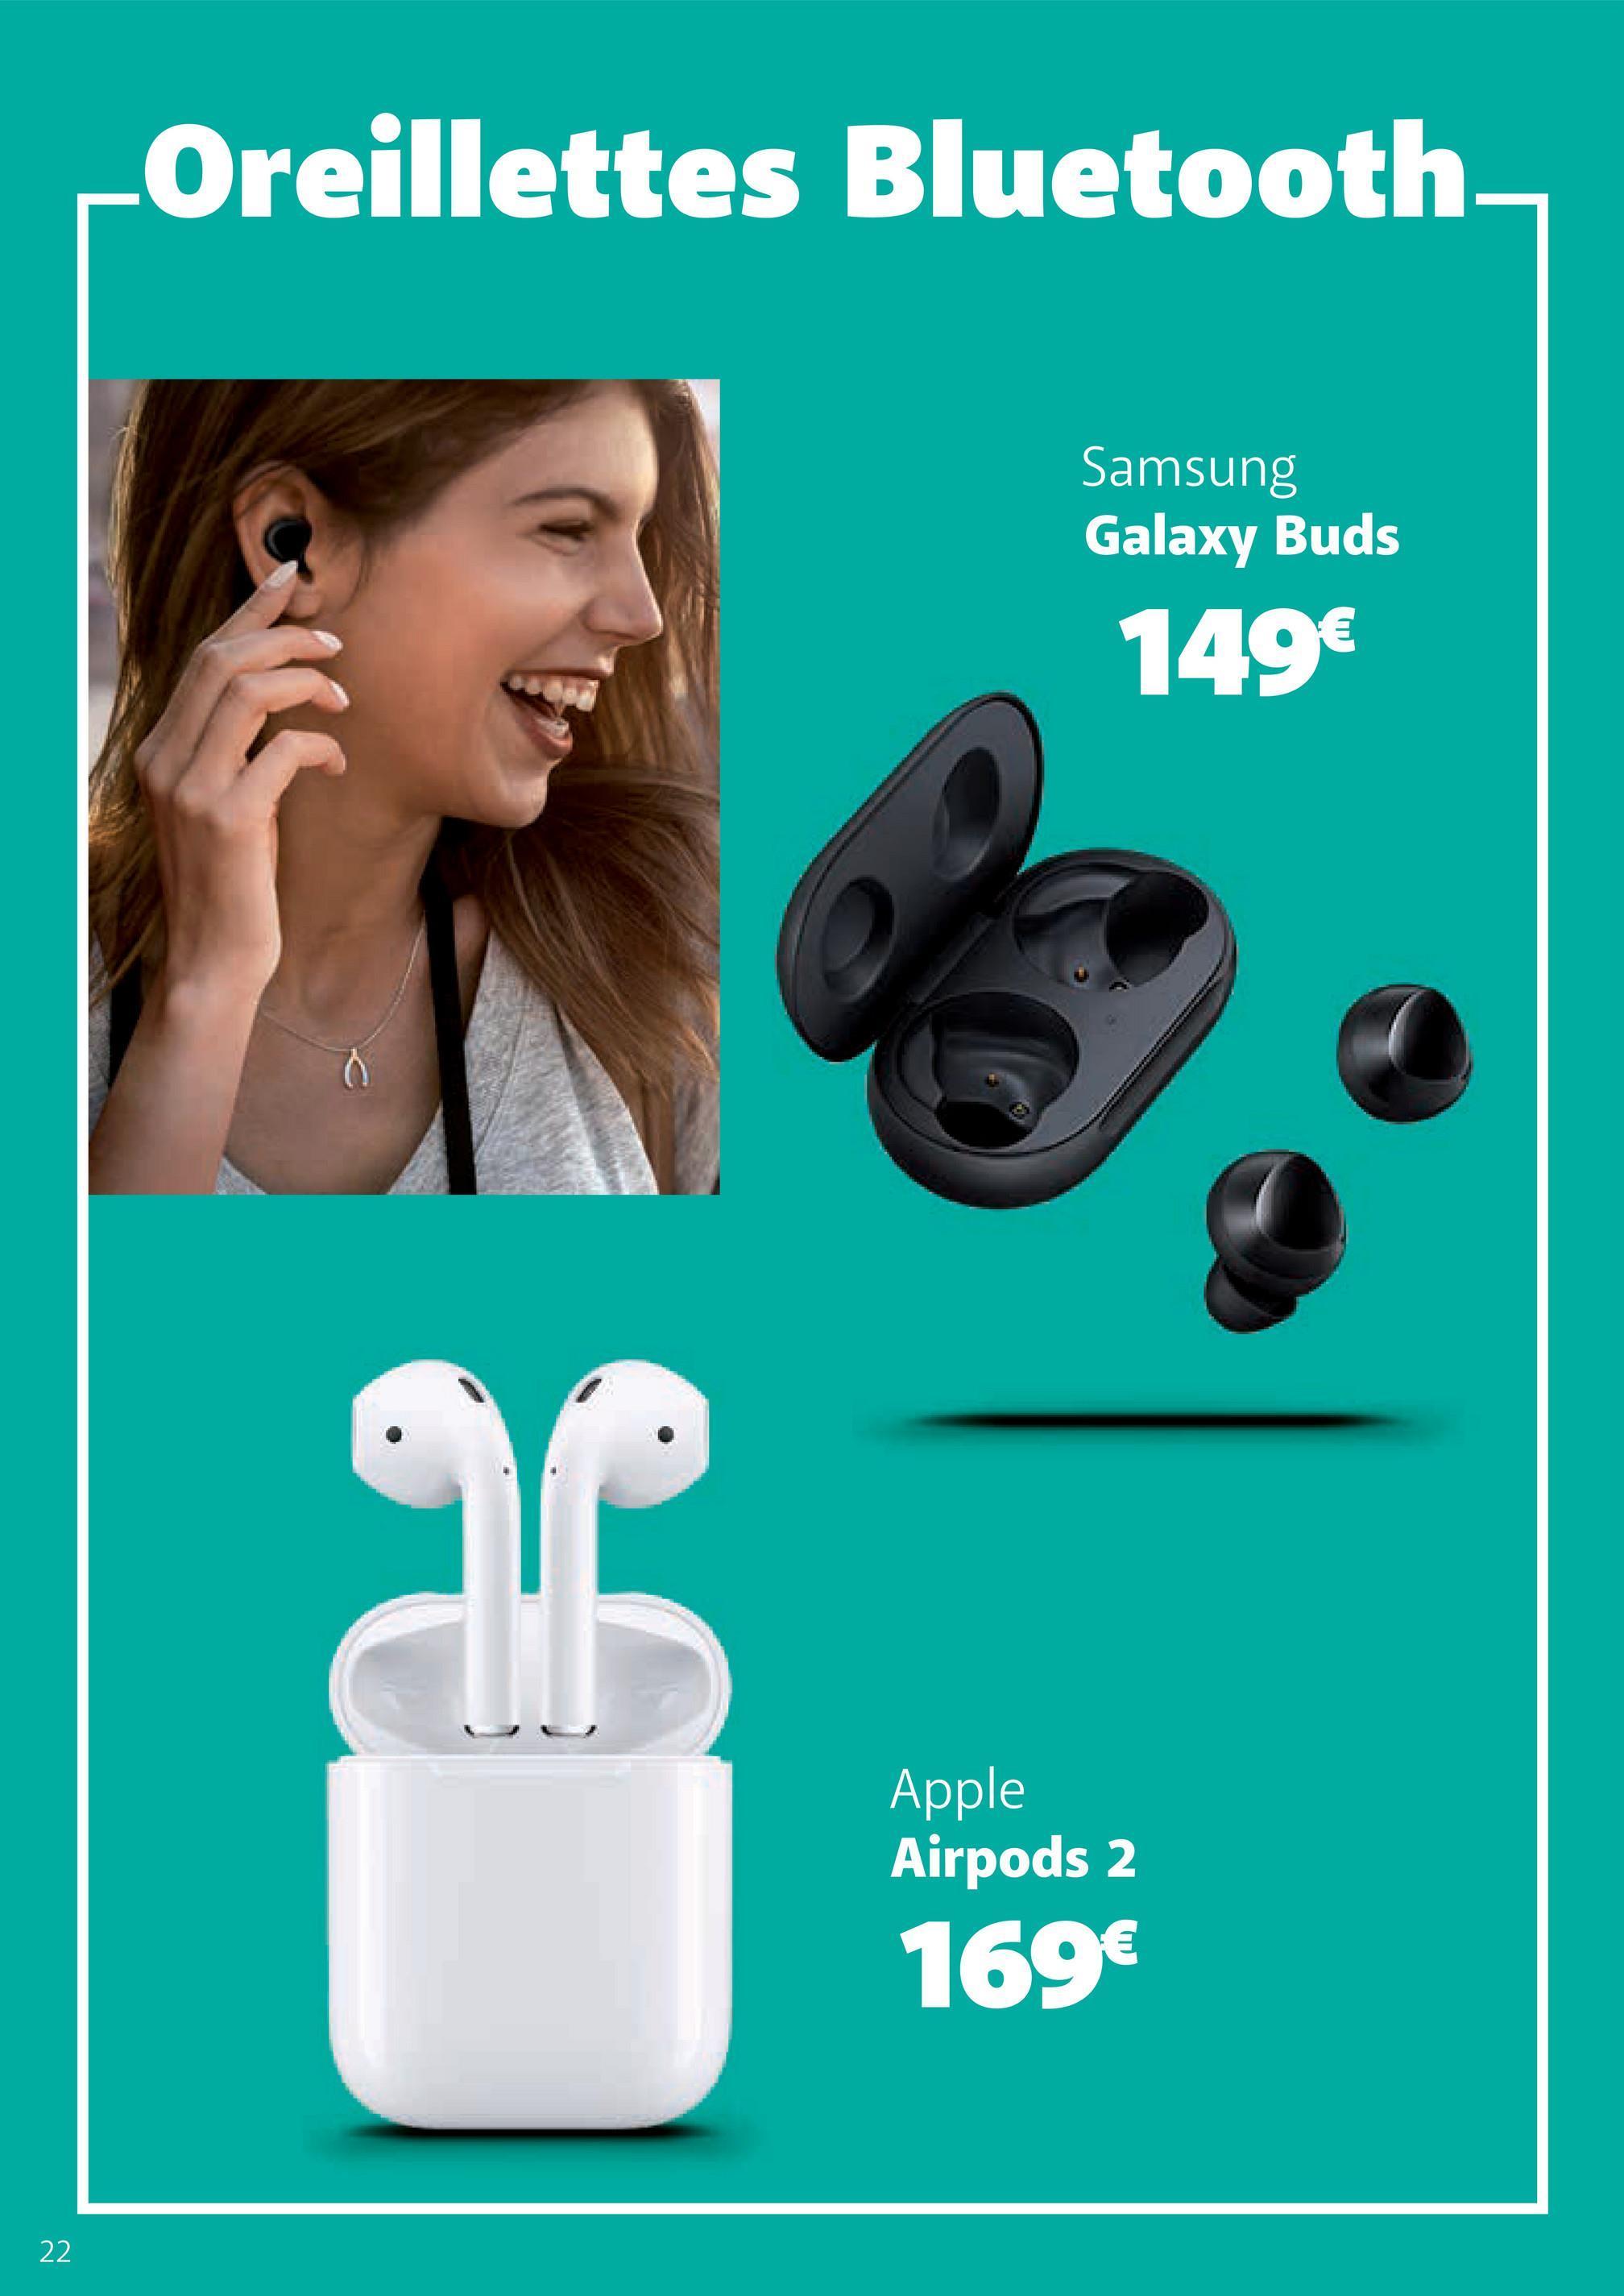 Oreillettes Bluetooth Samsung Galaxy Buds 149€ Apple Airpods 2 169€ - 22